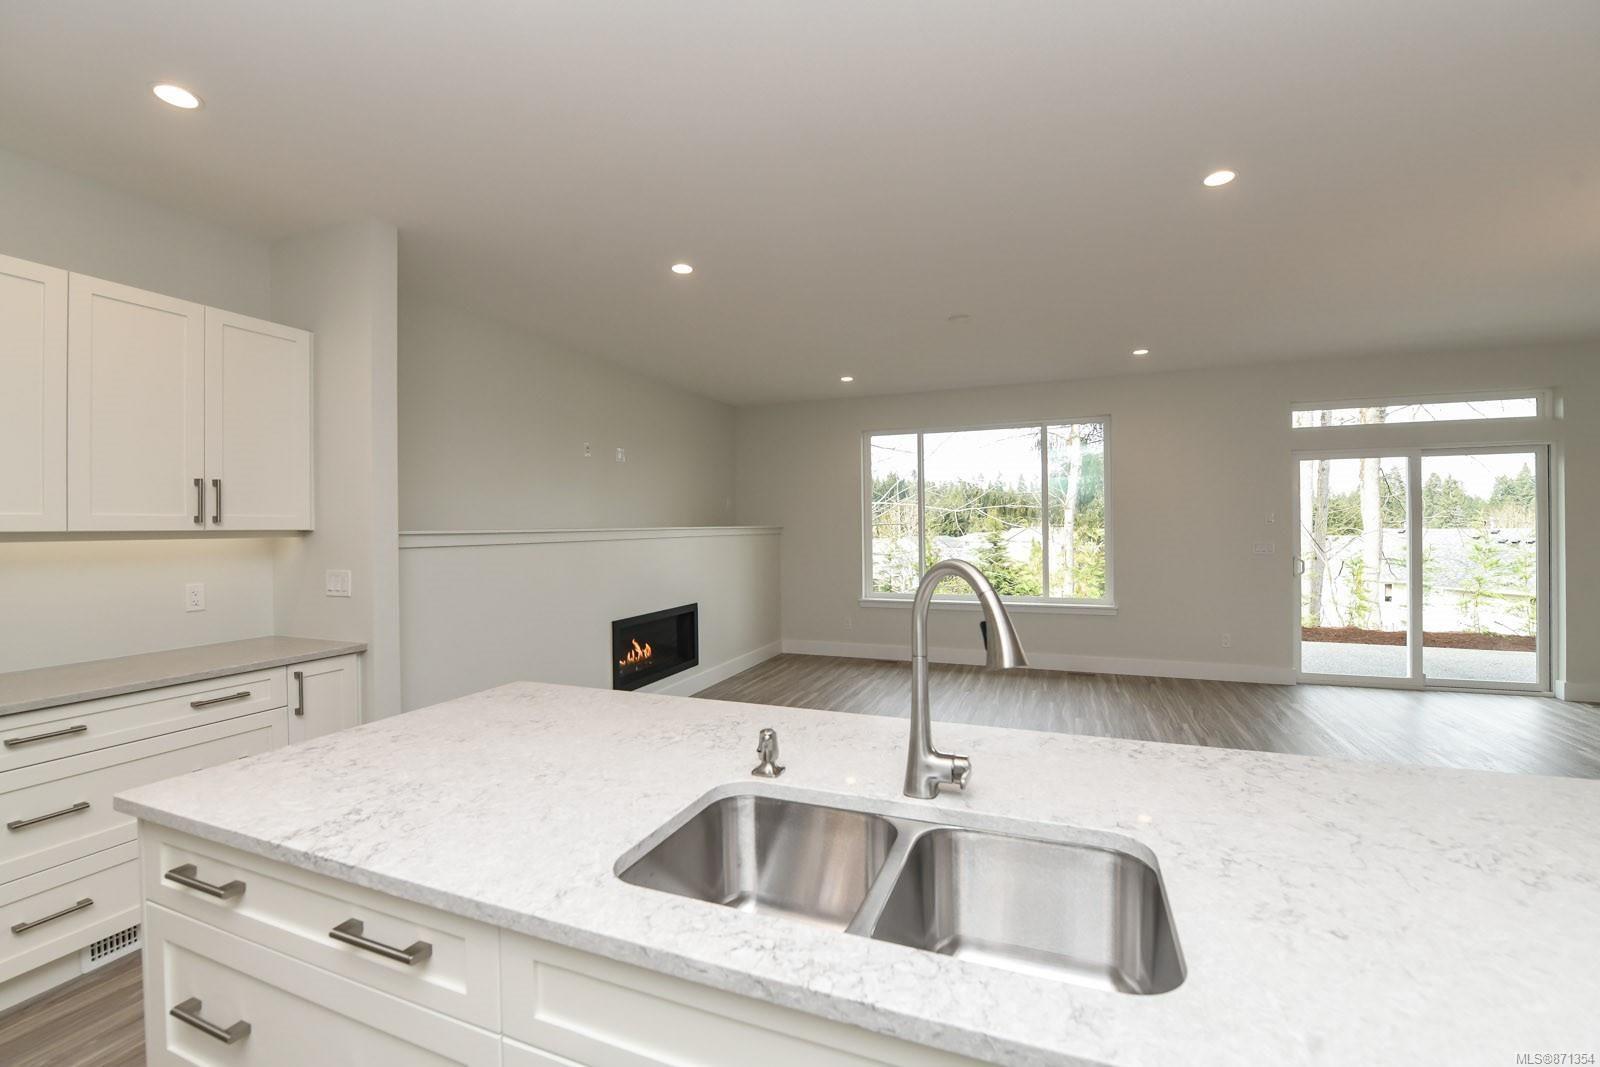 Photo 12: Photos: 68 Grayhawk Pl in : CV Courtenay City House for sale (Comox Valley)  : MLS®# 871354